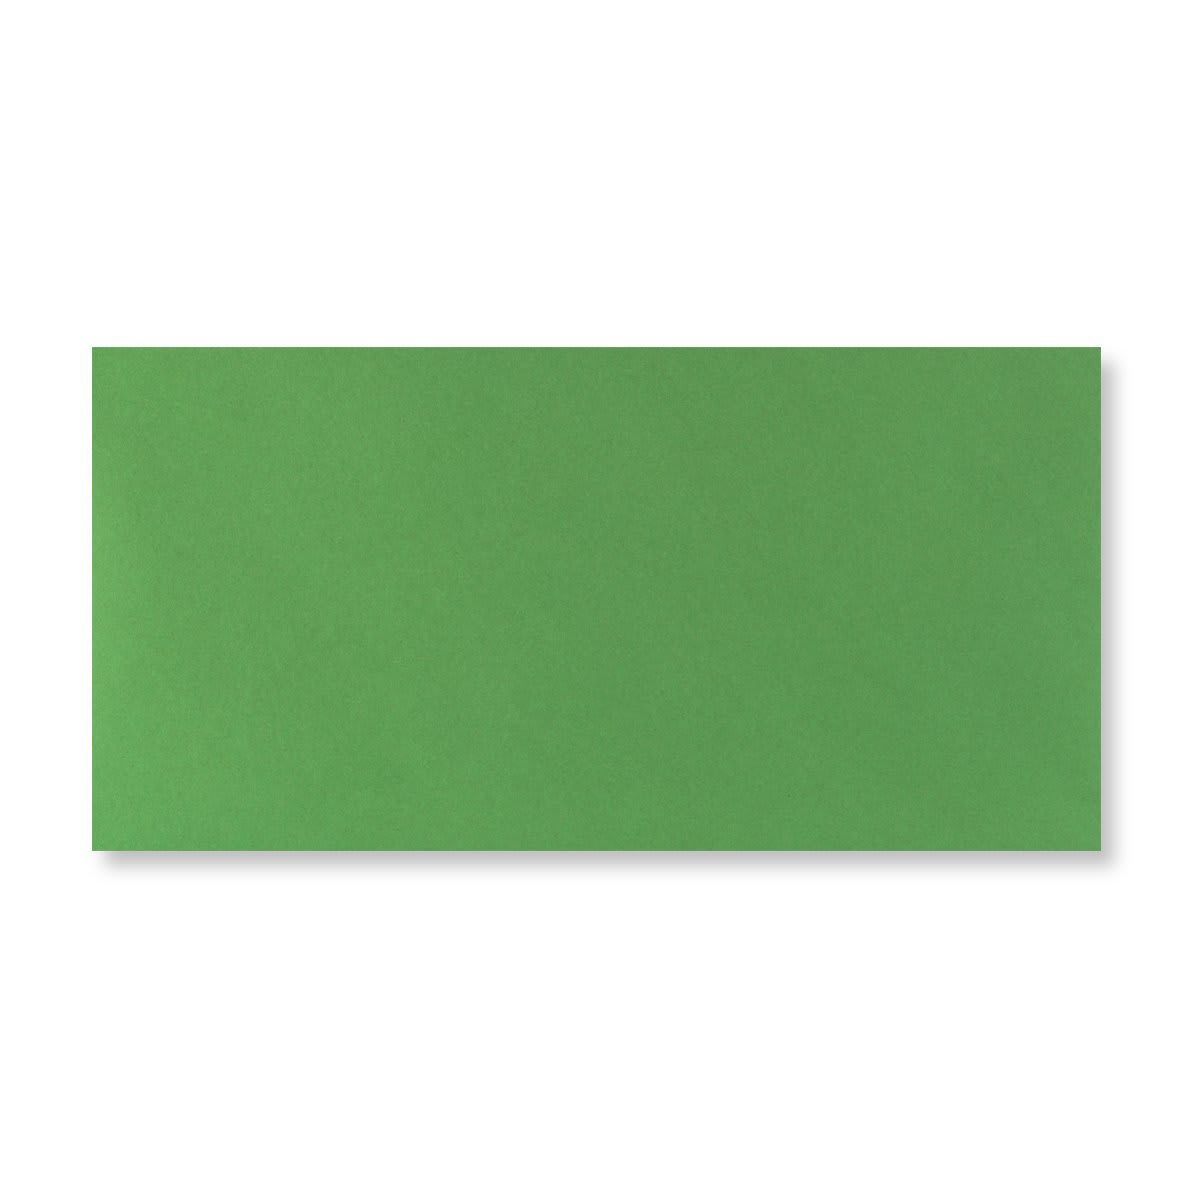 DL XMAS GREEN ENVELOPES